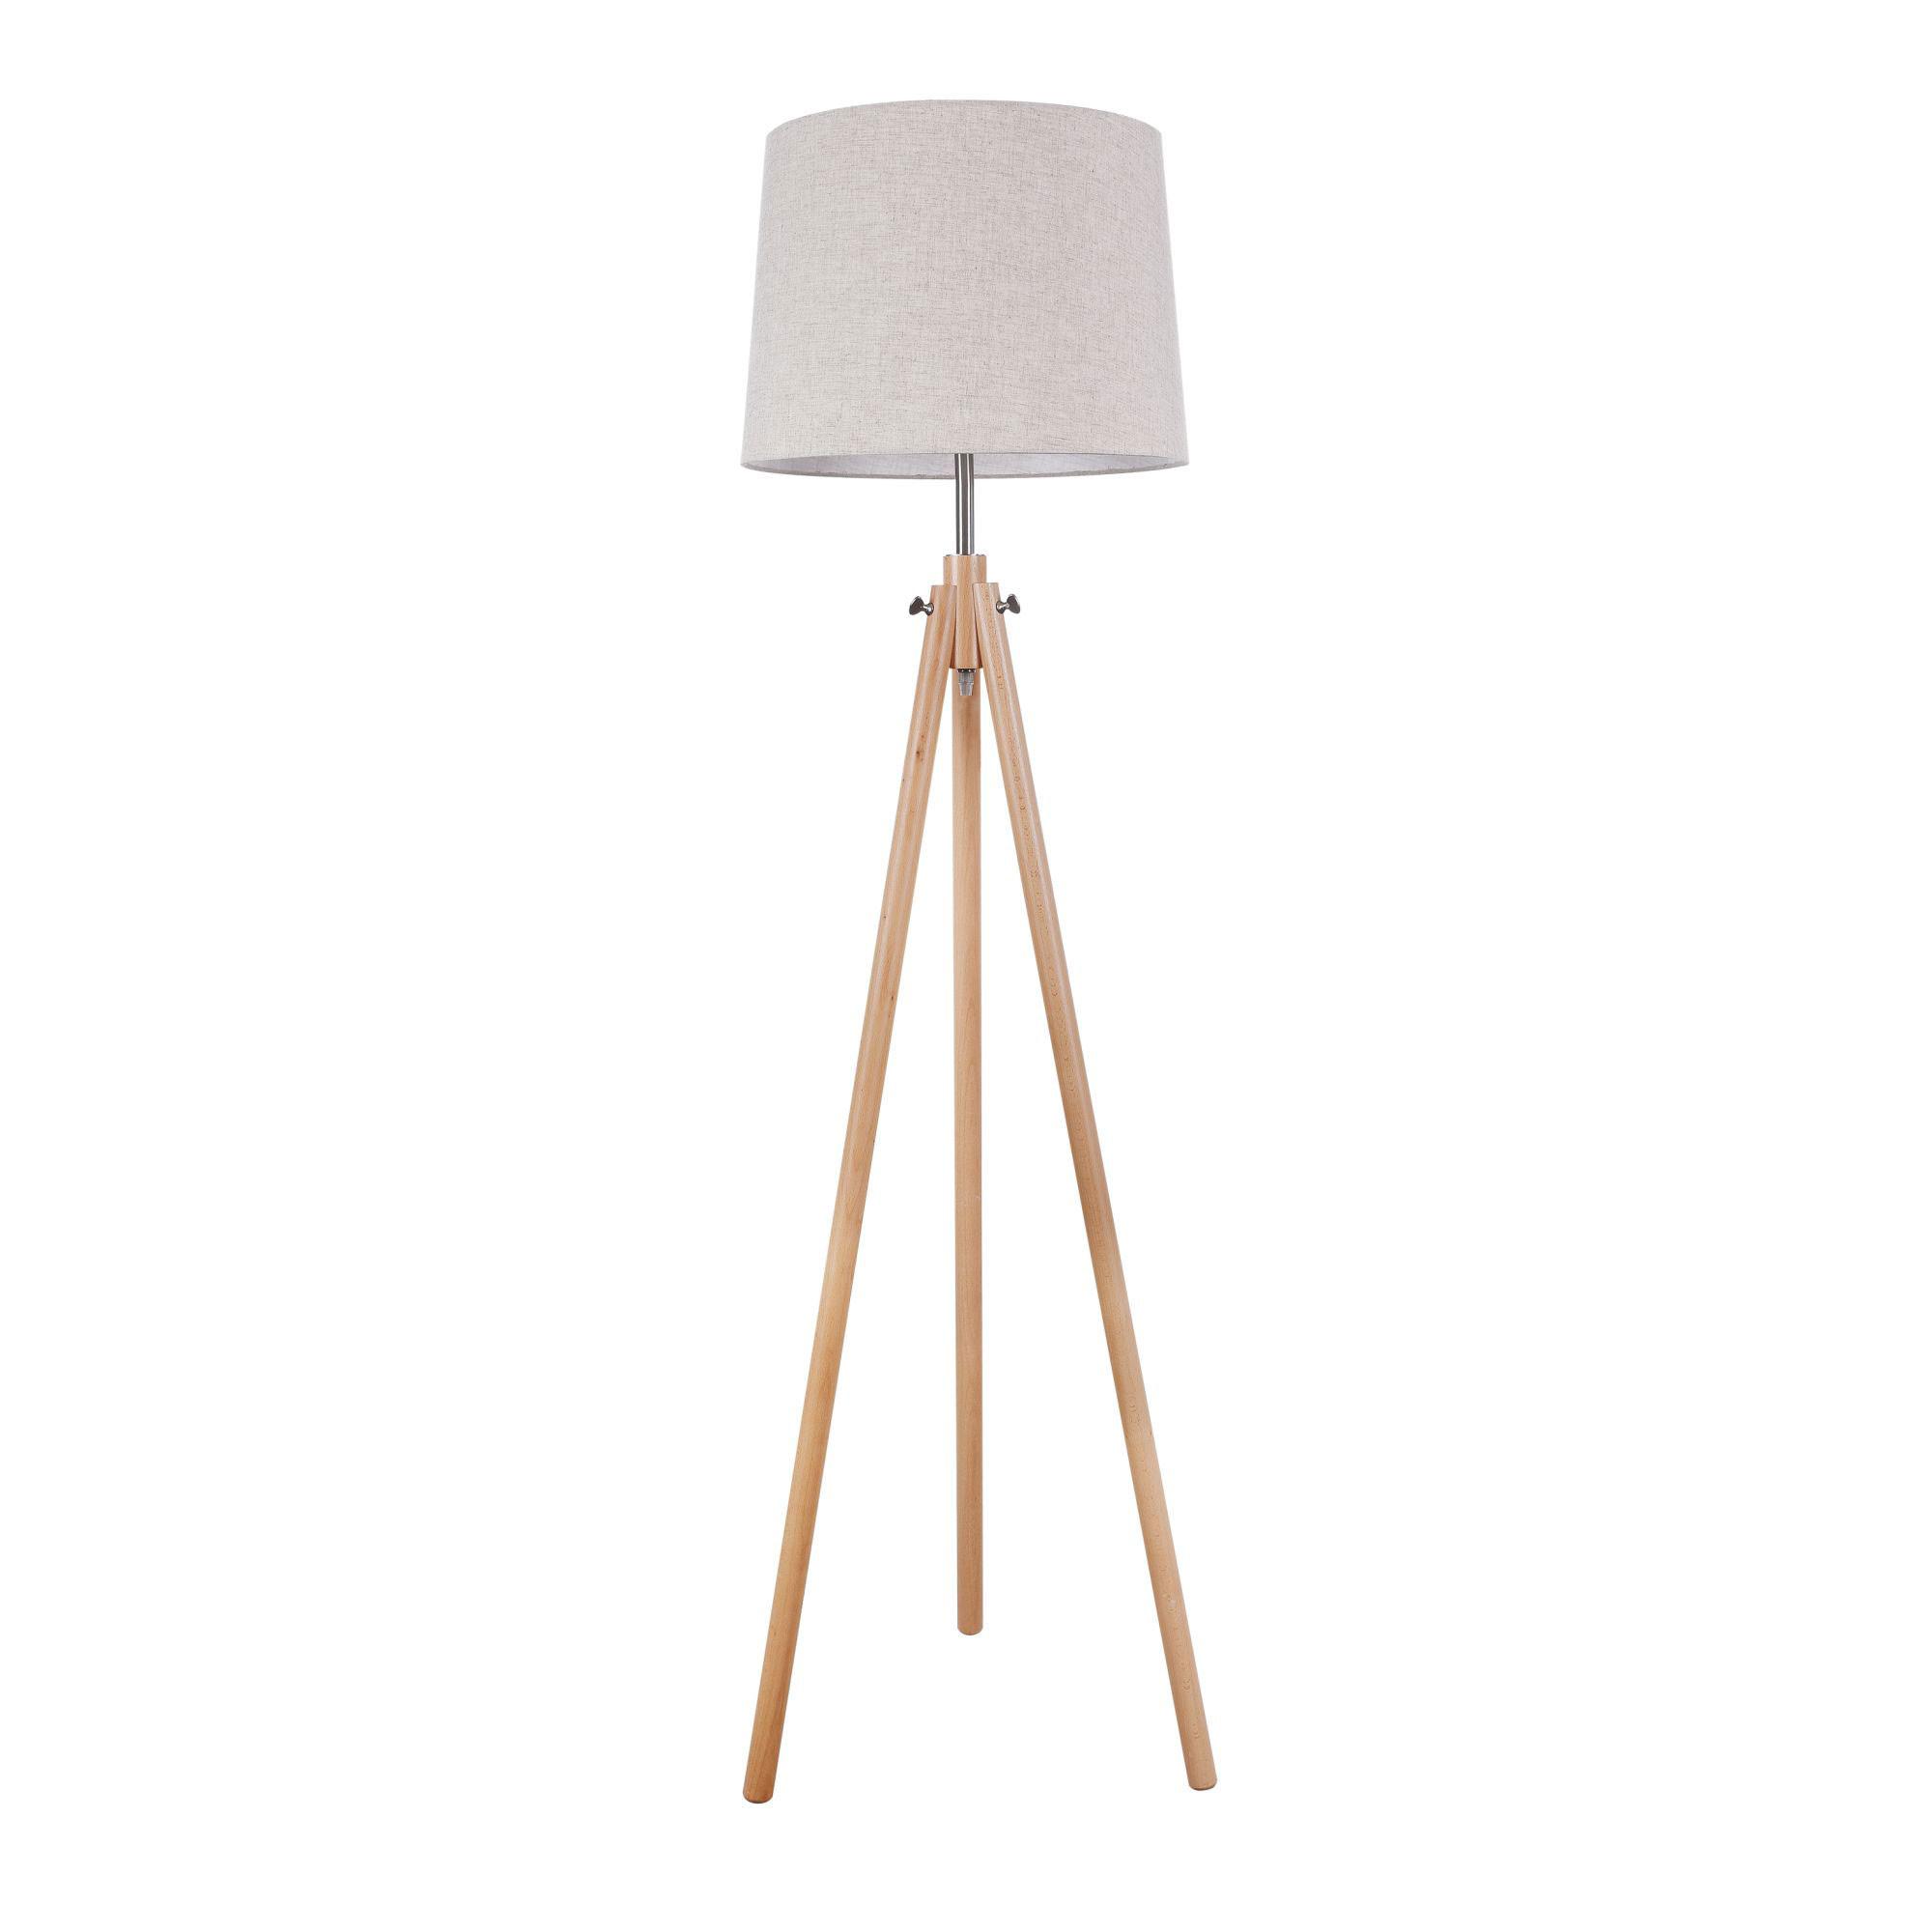 Lampade Da Terra In Legno.Maytoni Lampada Da Terra In Stile Moderno In Legno Calvin Table